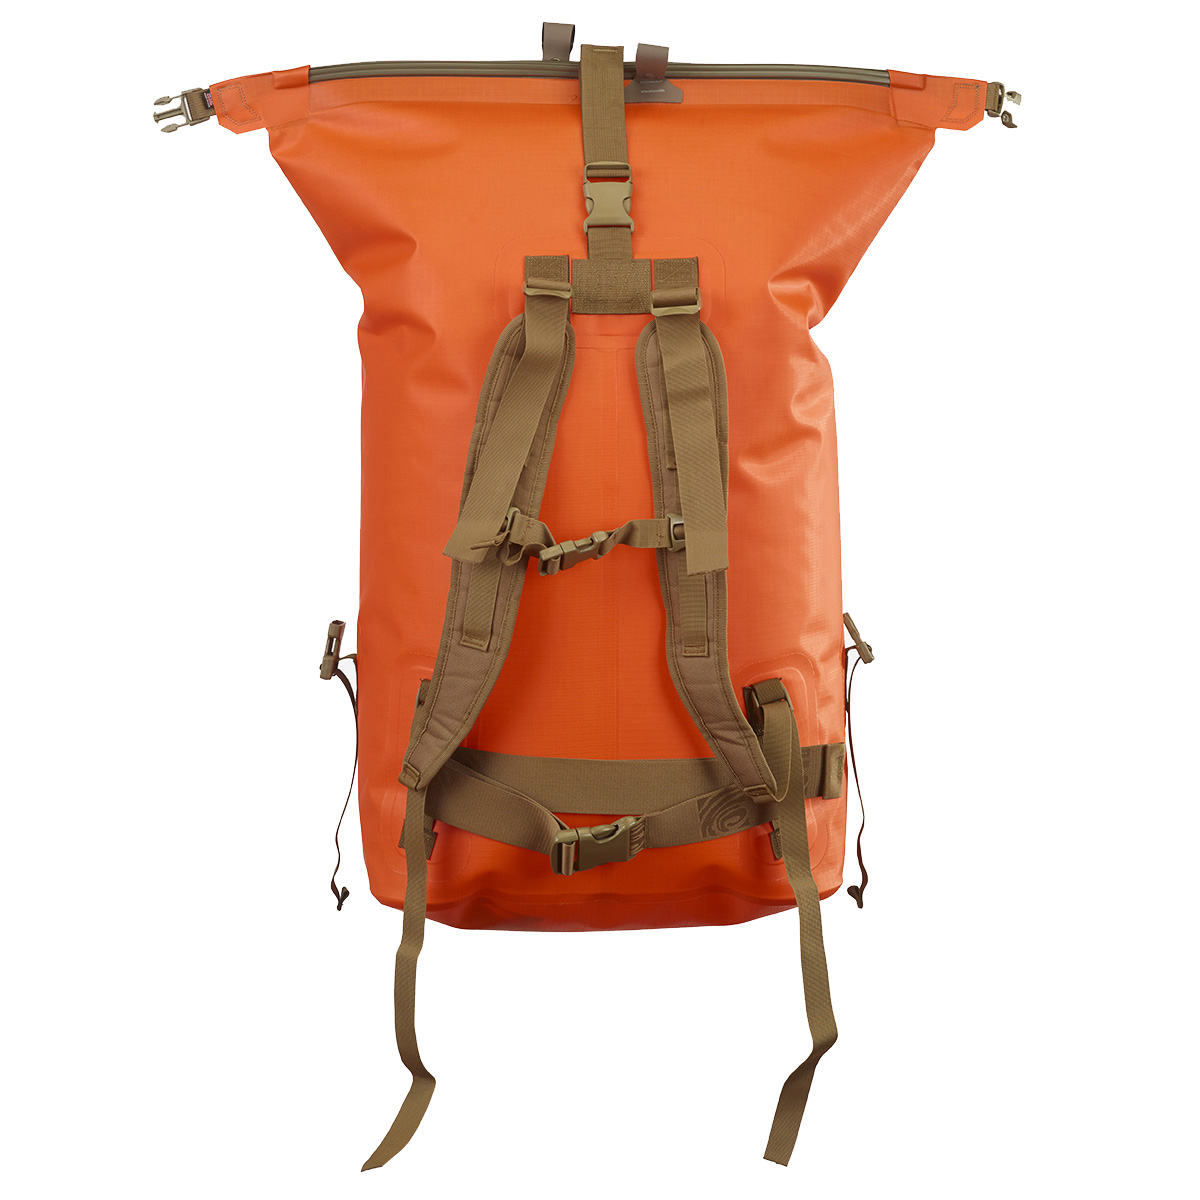 aecc7130f2 Westwater™ – Watershed Drybags